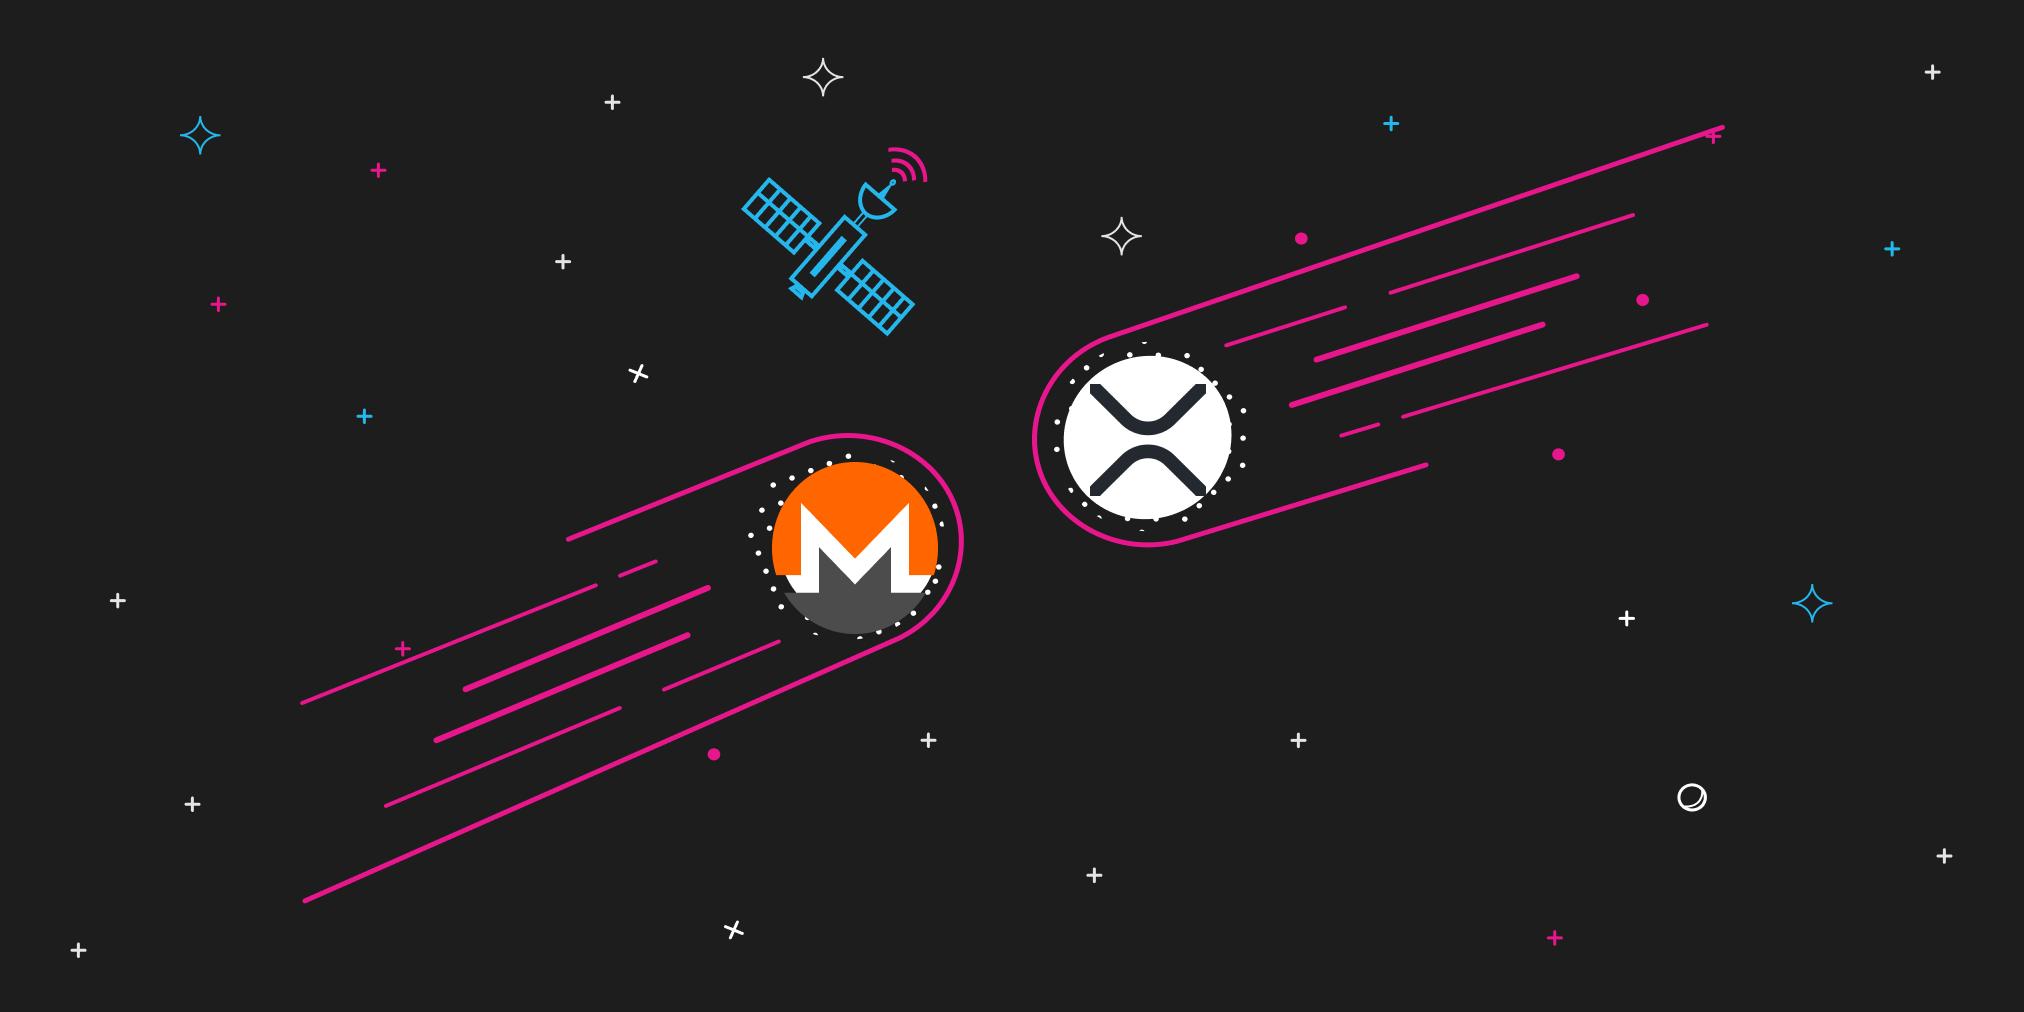 Exchange XMR to XRP on Swapzone